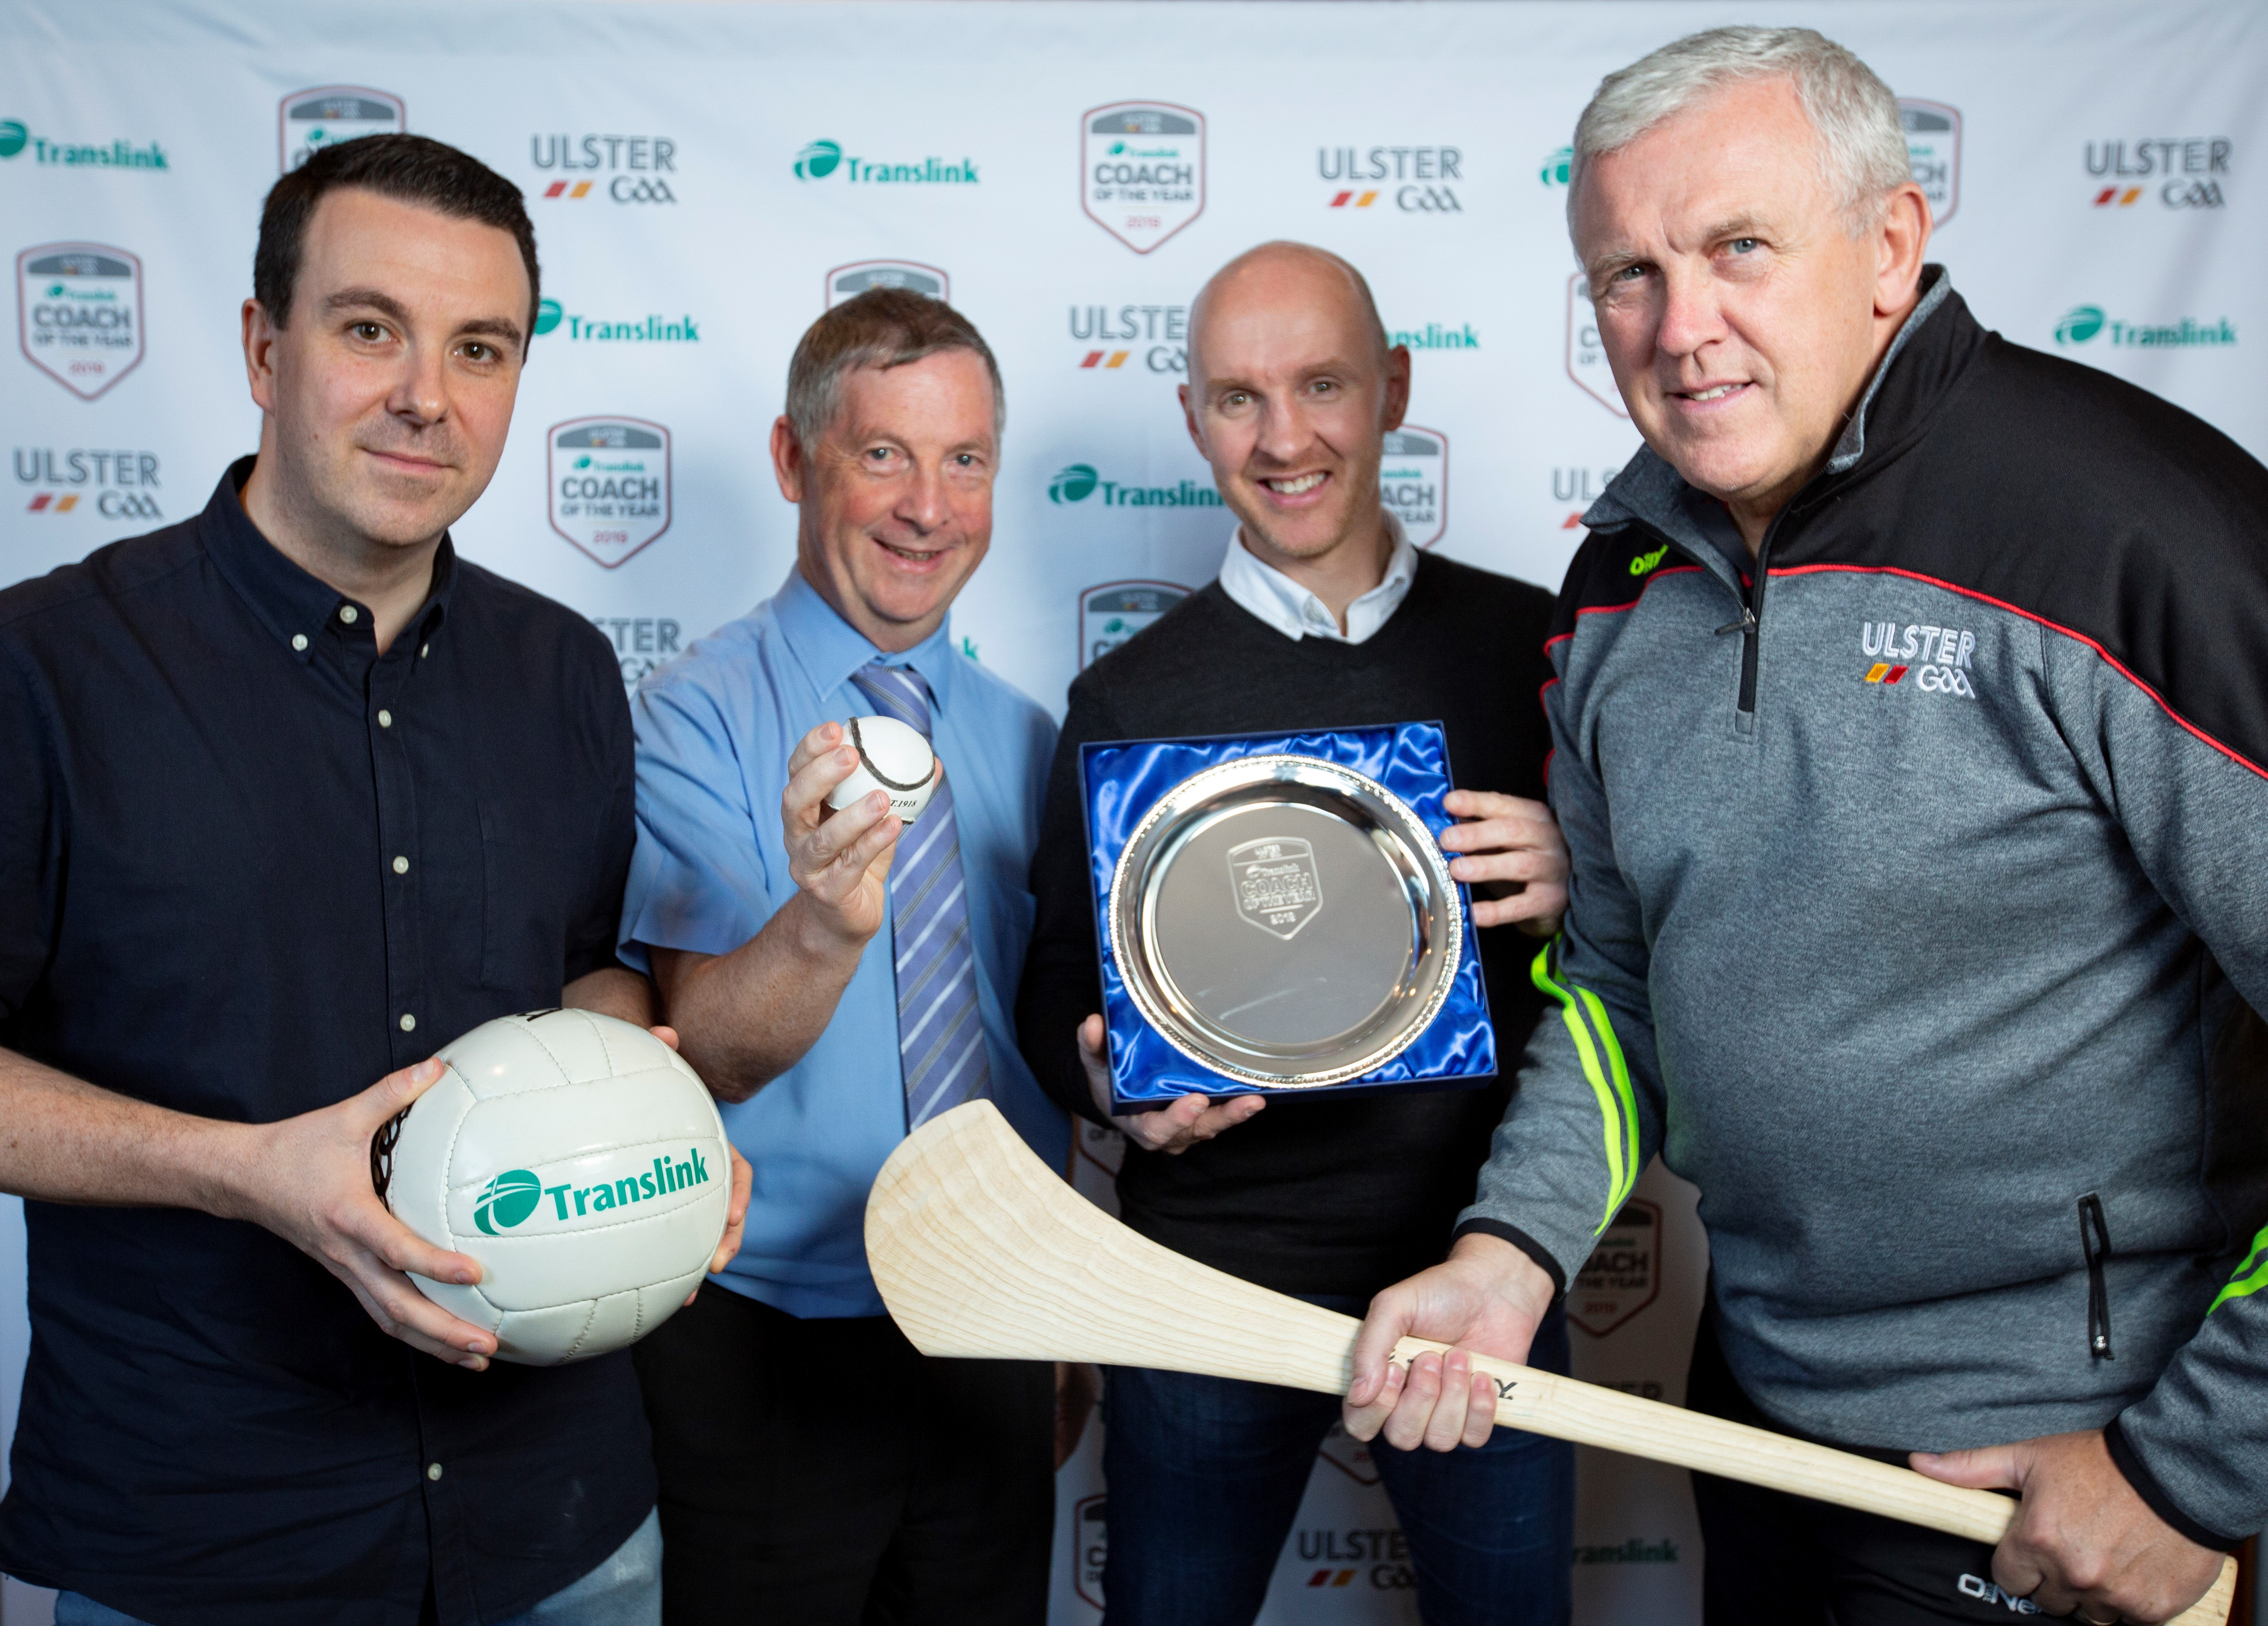 Translink Ulster GAA 'Coach of the Year' finalists on cloud 9